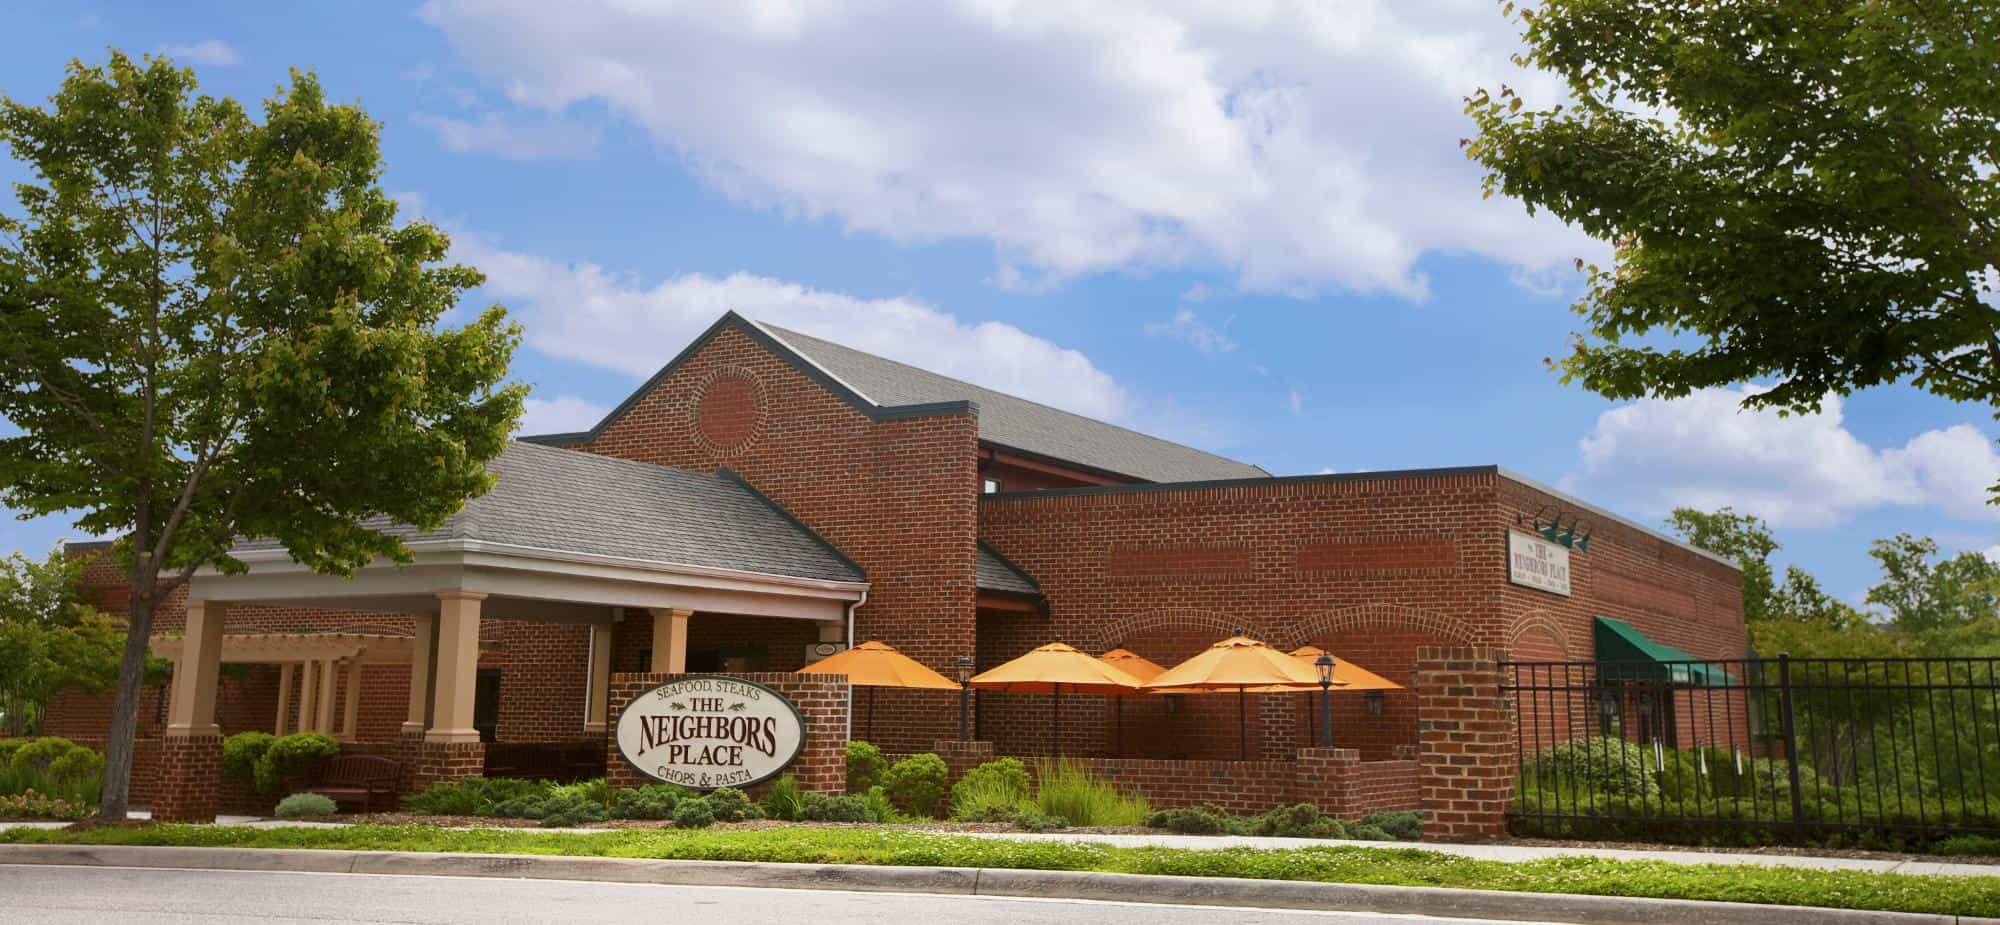 Neighbors Place Restaurant Best Restaurants Lynchburg